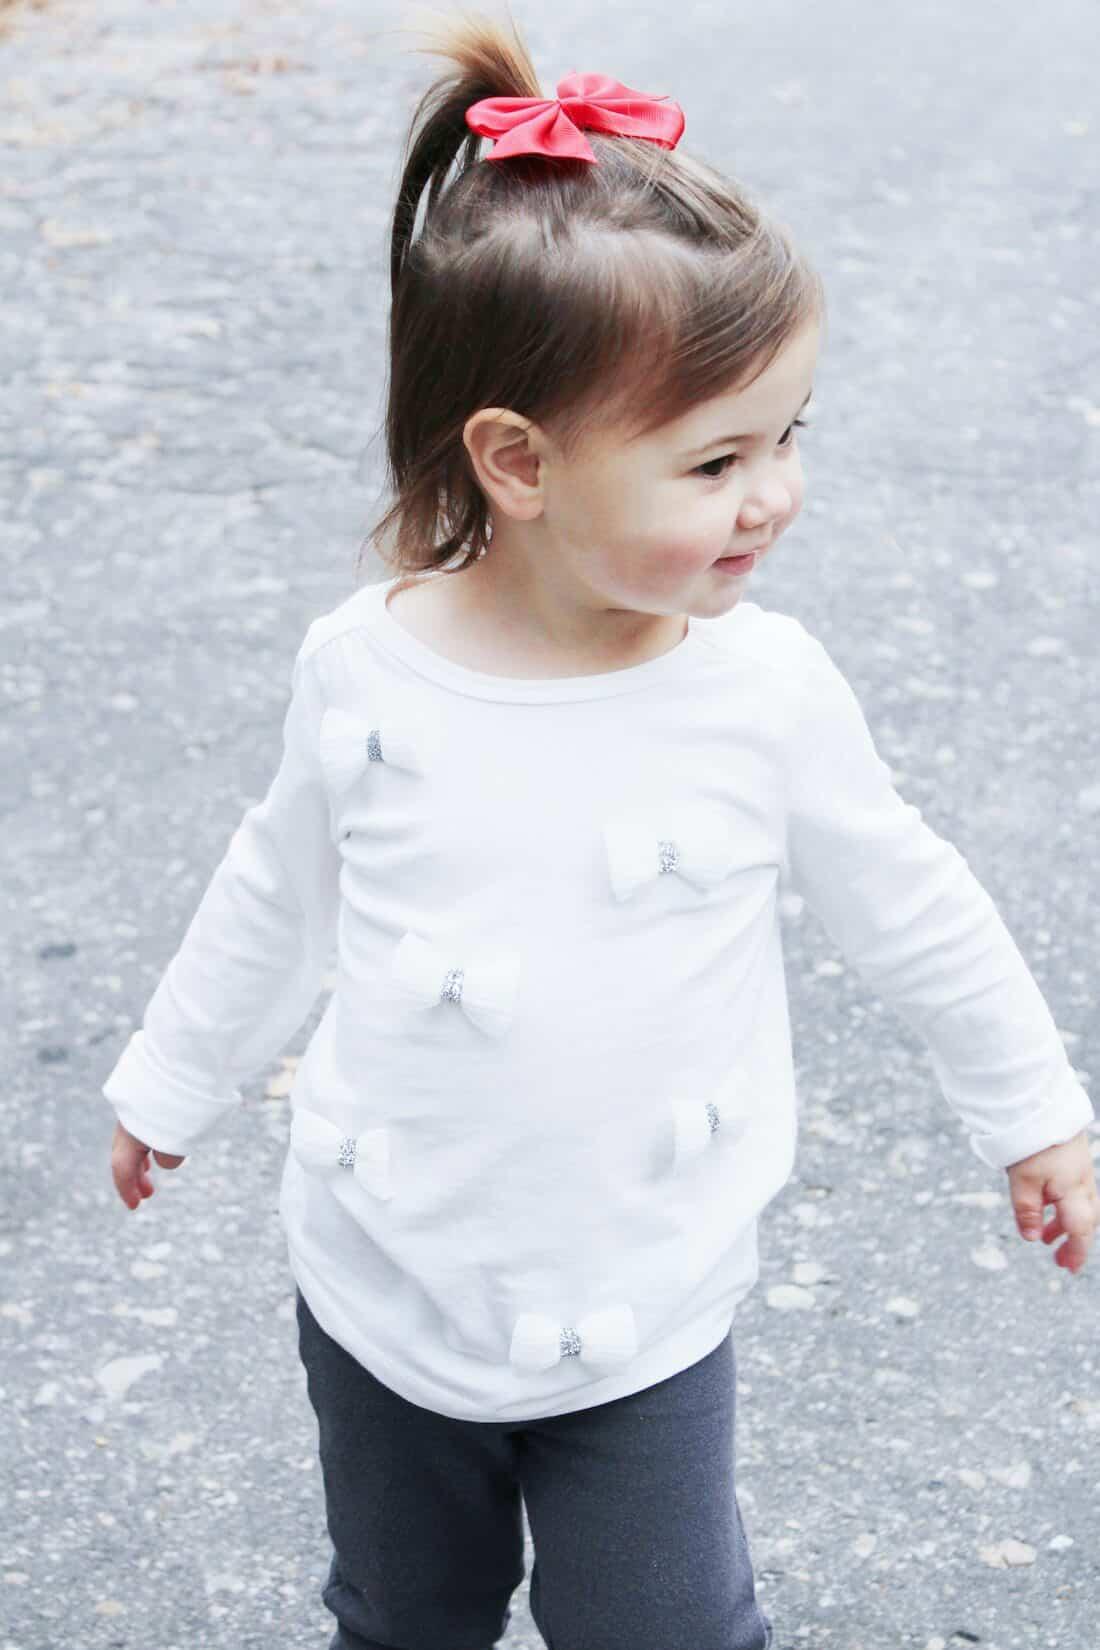 Toddler girl walks down road.